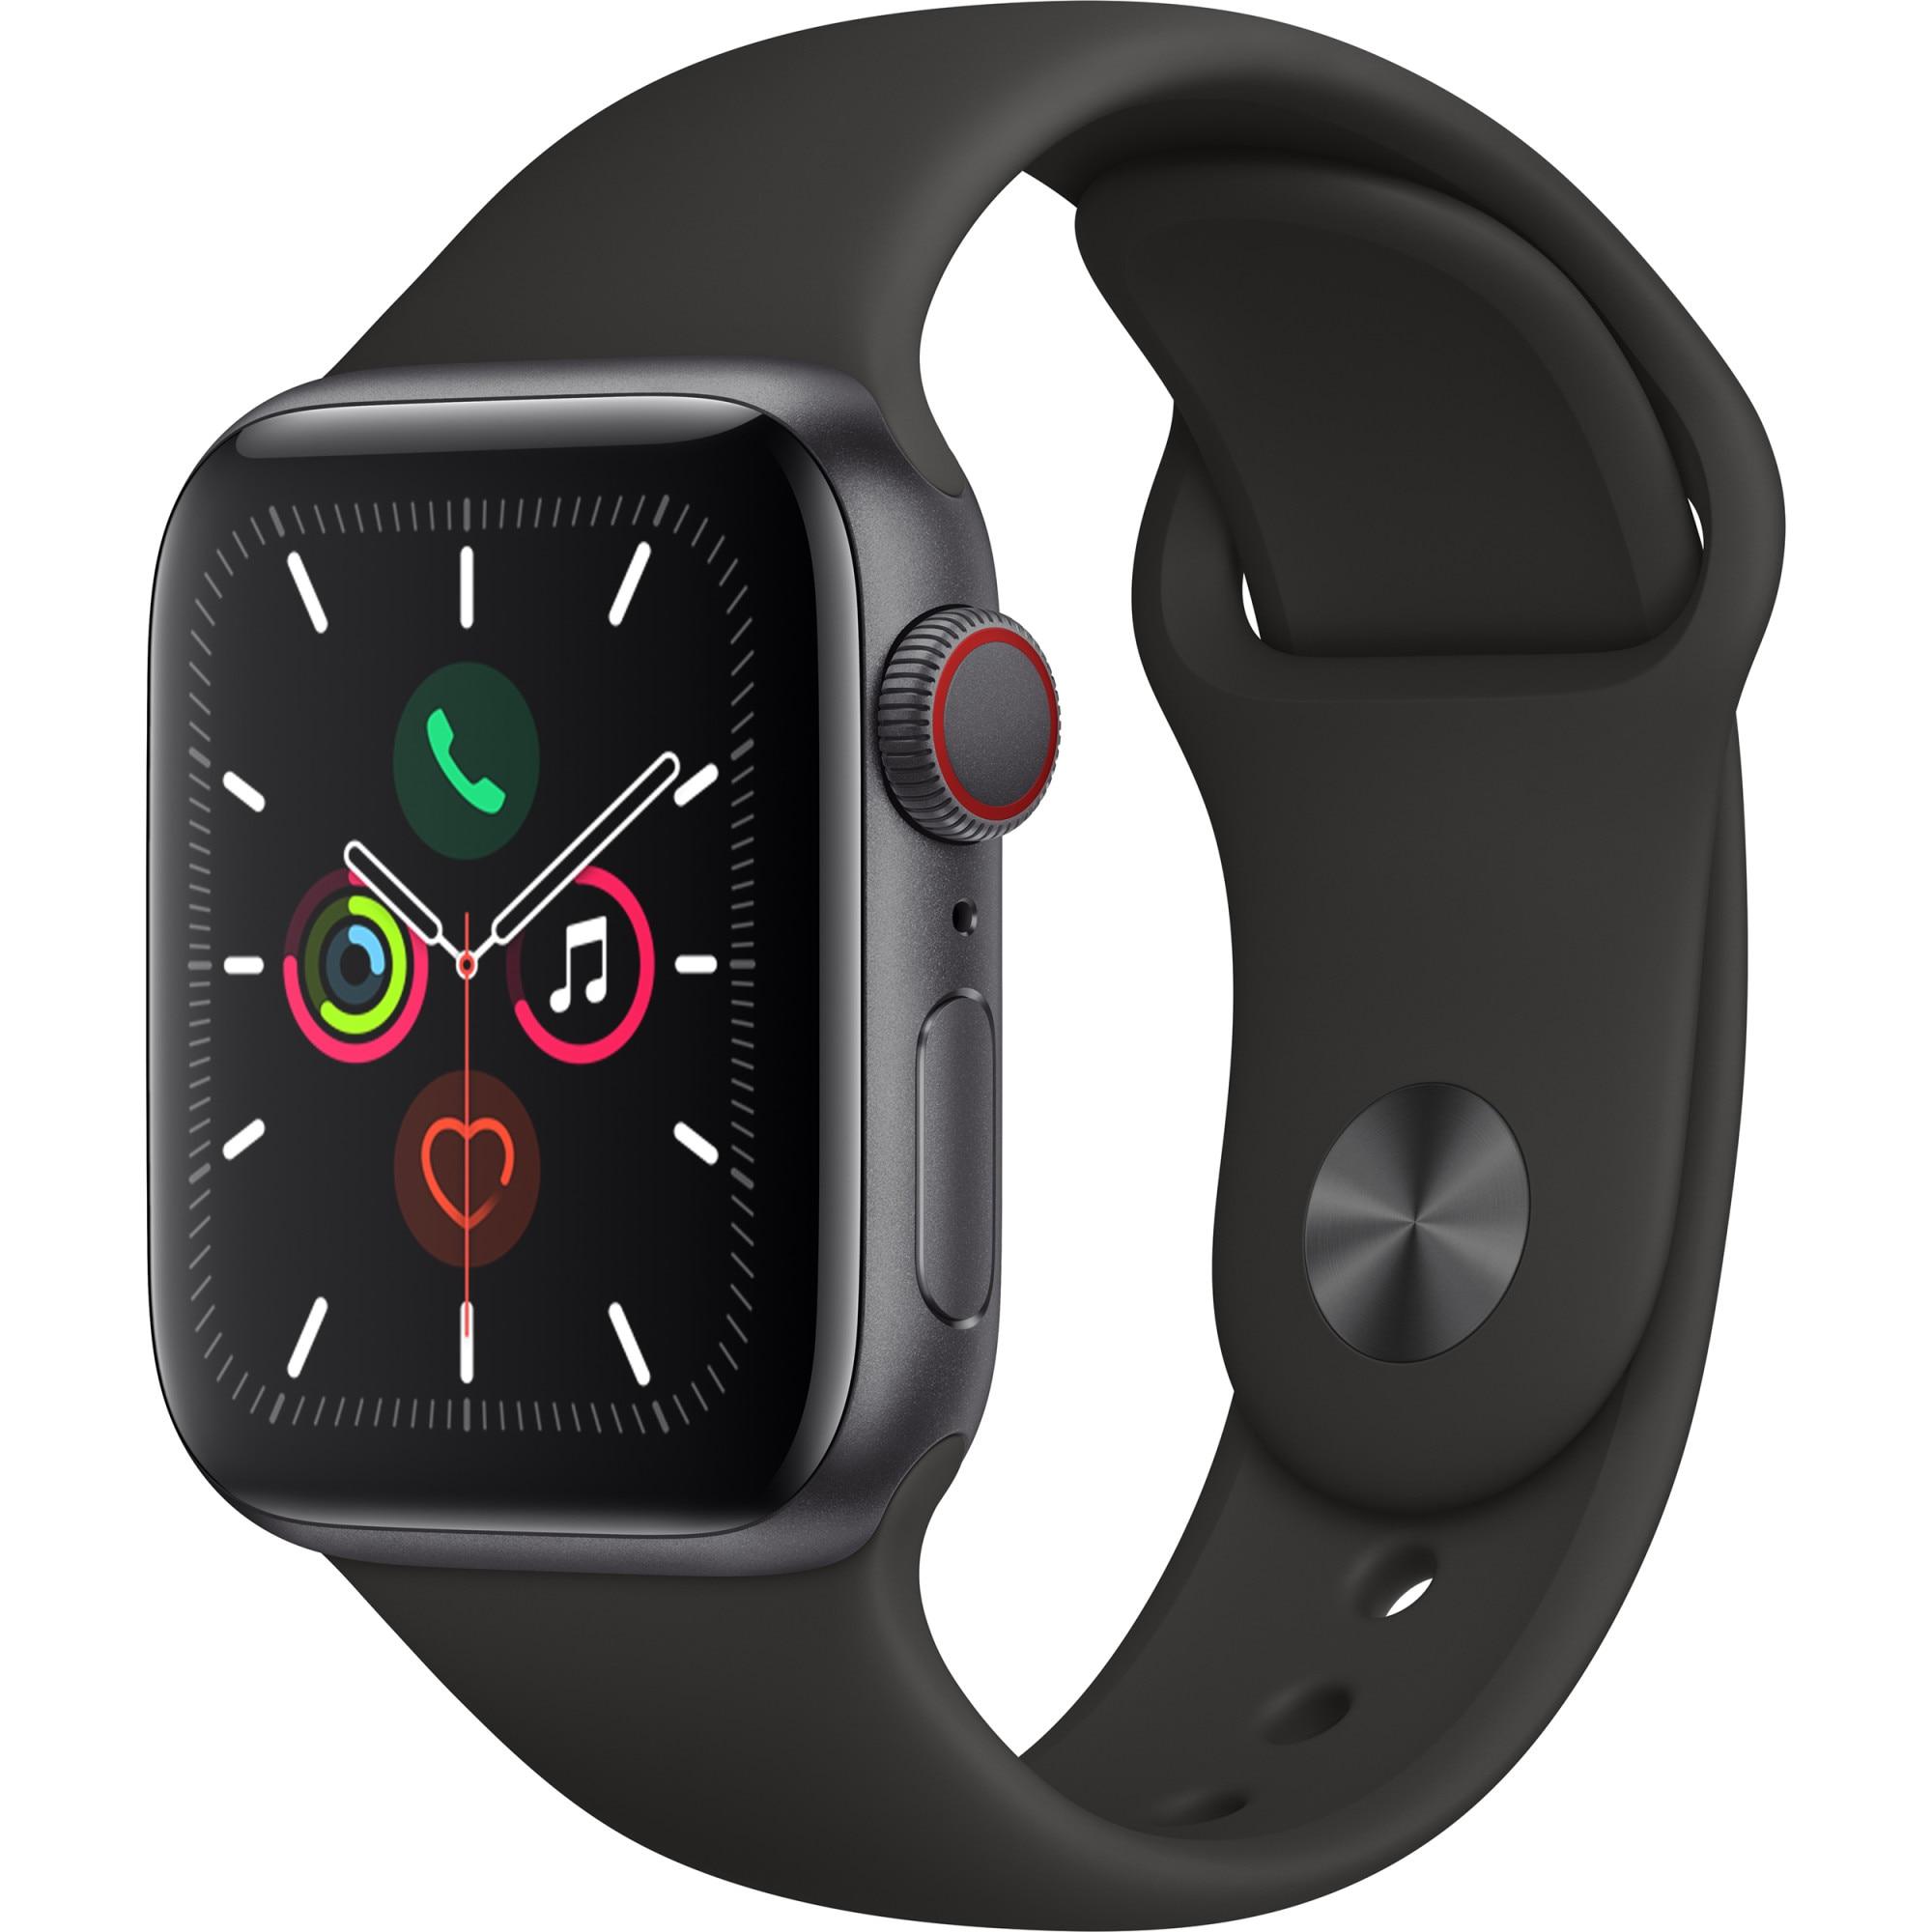 Fotografie Apple Watch 5, GPS, Cellular, Carcasa Space Grey Aluminium 40mm, Black Sport Band - S/M & M/L